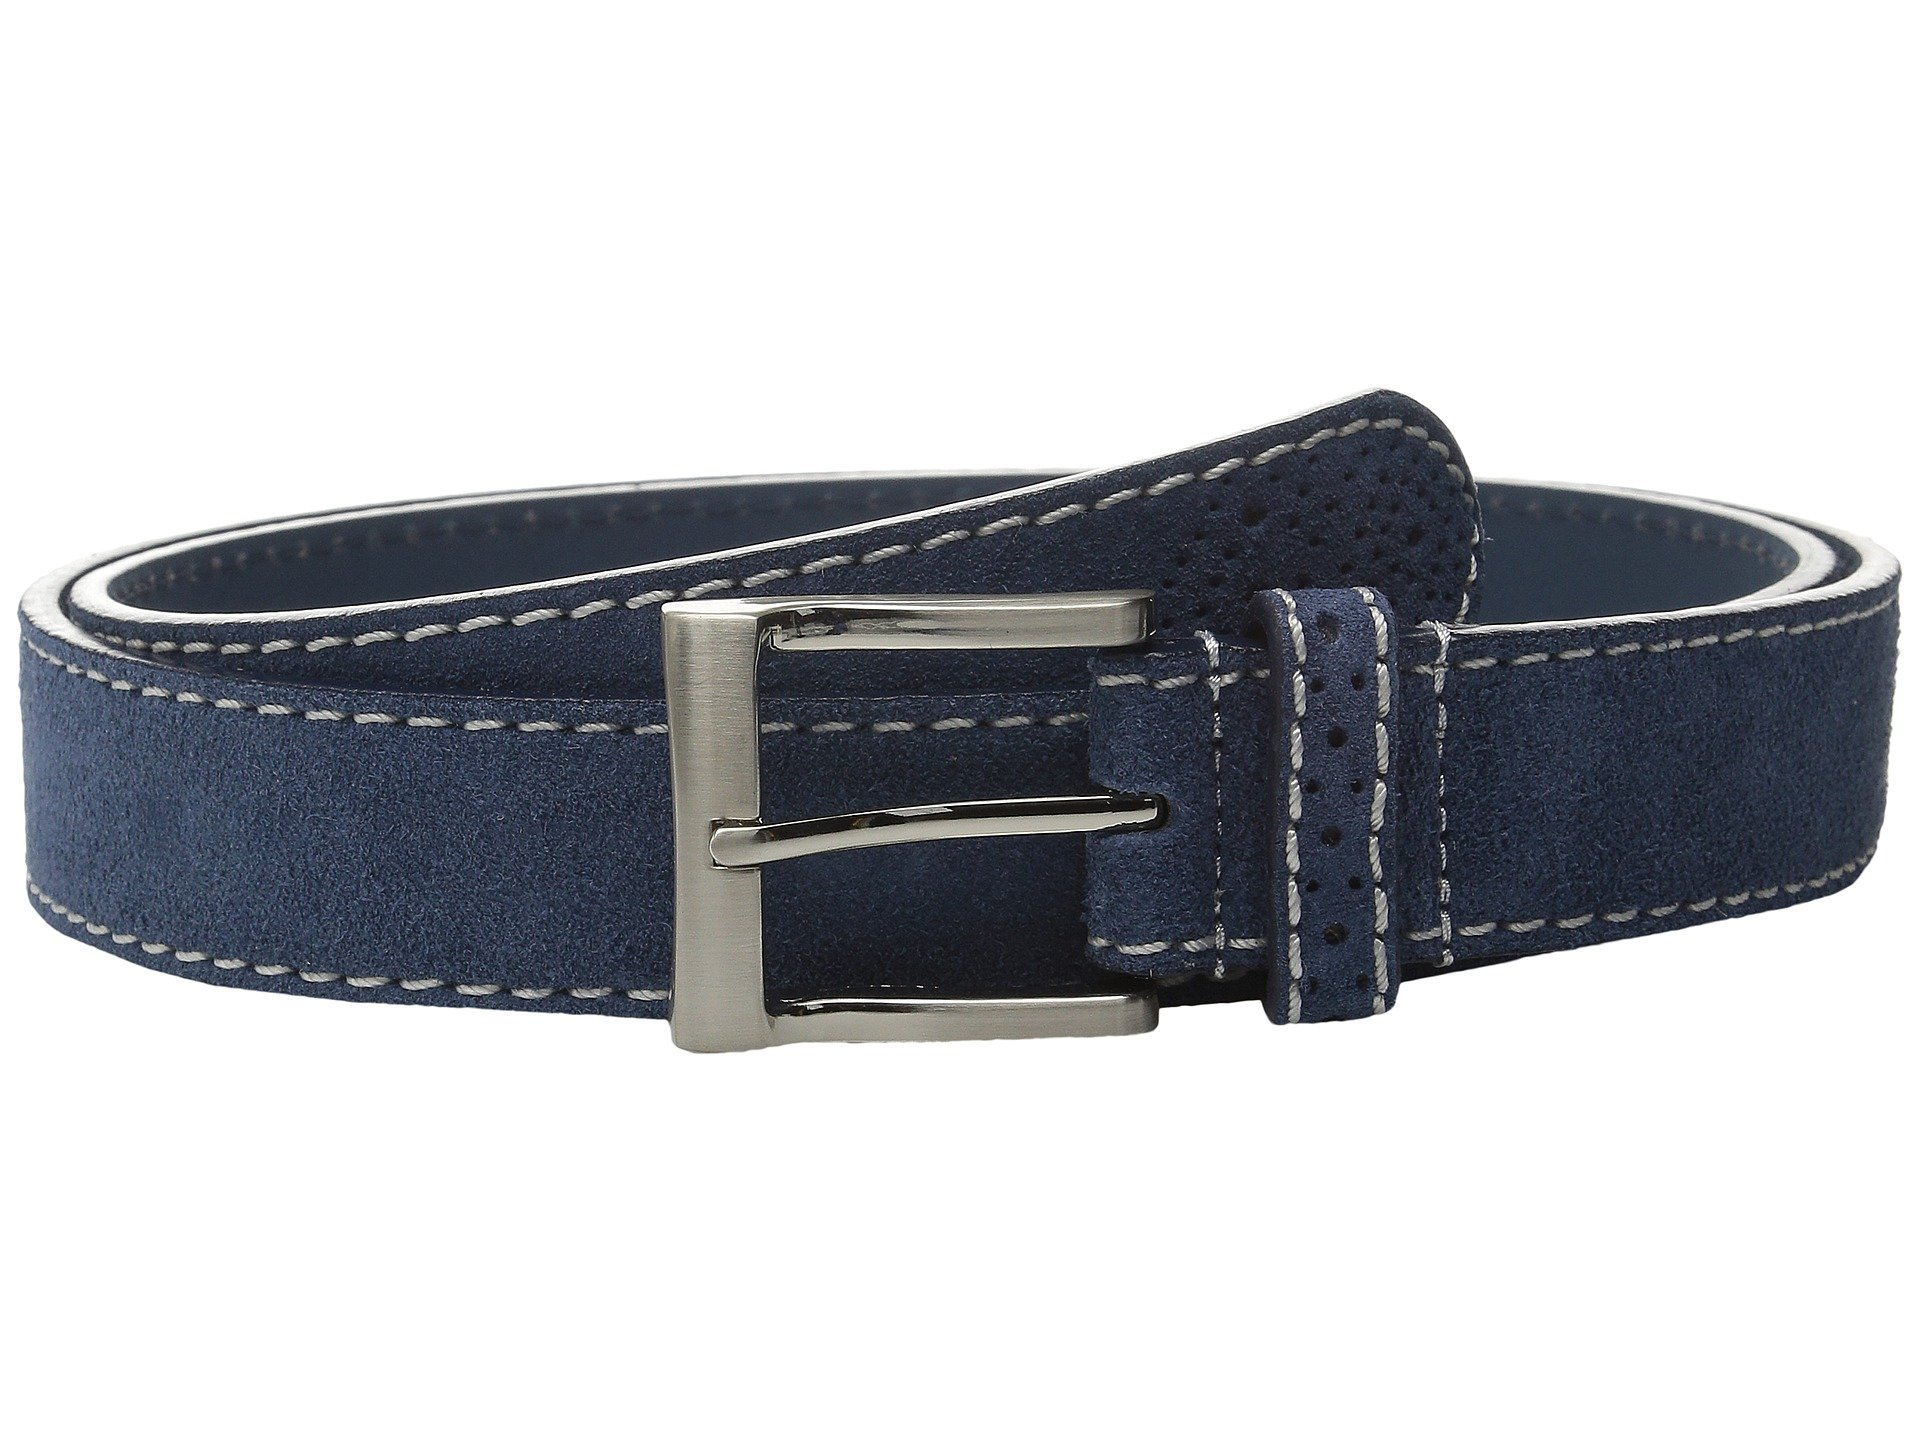 Correa o Cinturon para Hombre Florsheim 32mm Suede Leather Belt  + Florsheim en VeoyCompro.net